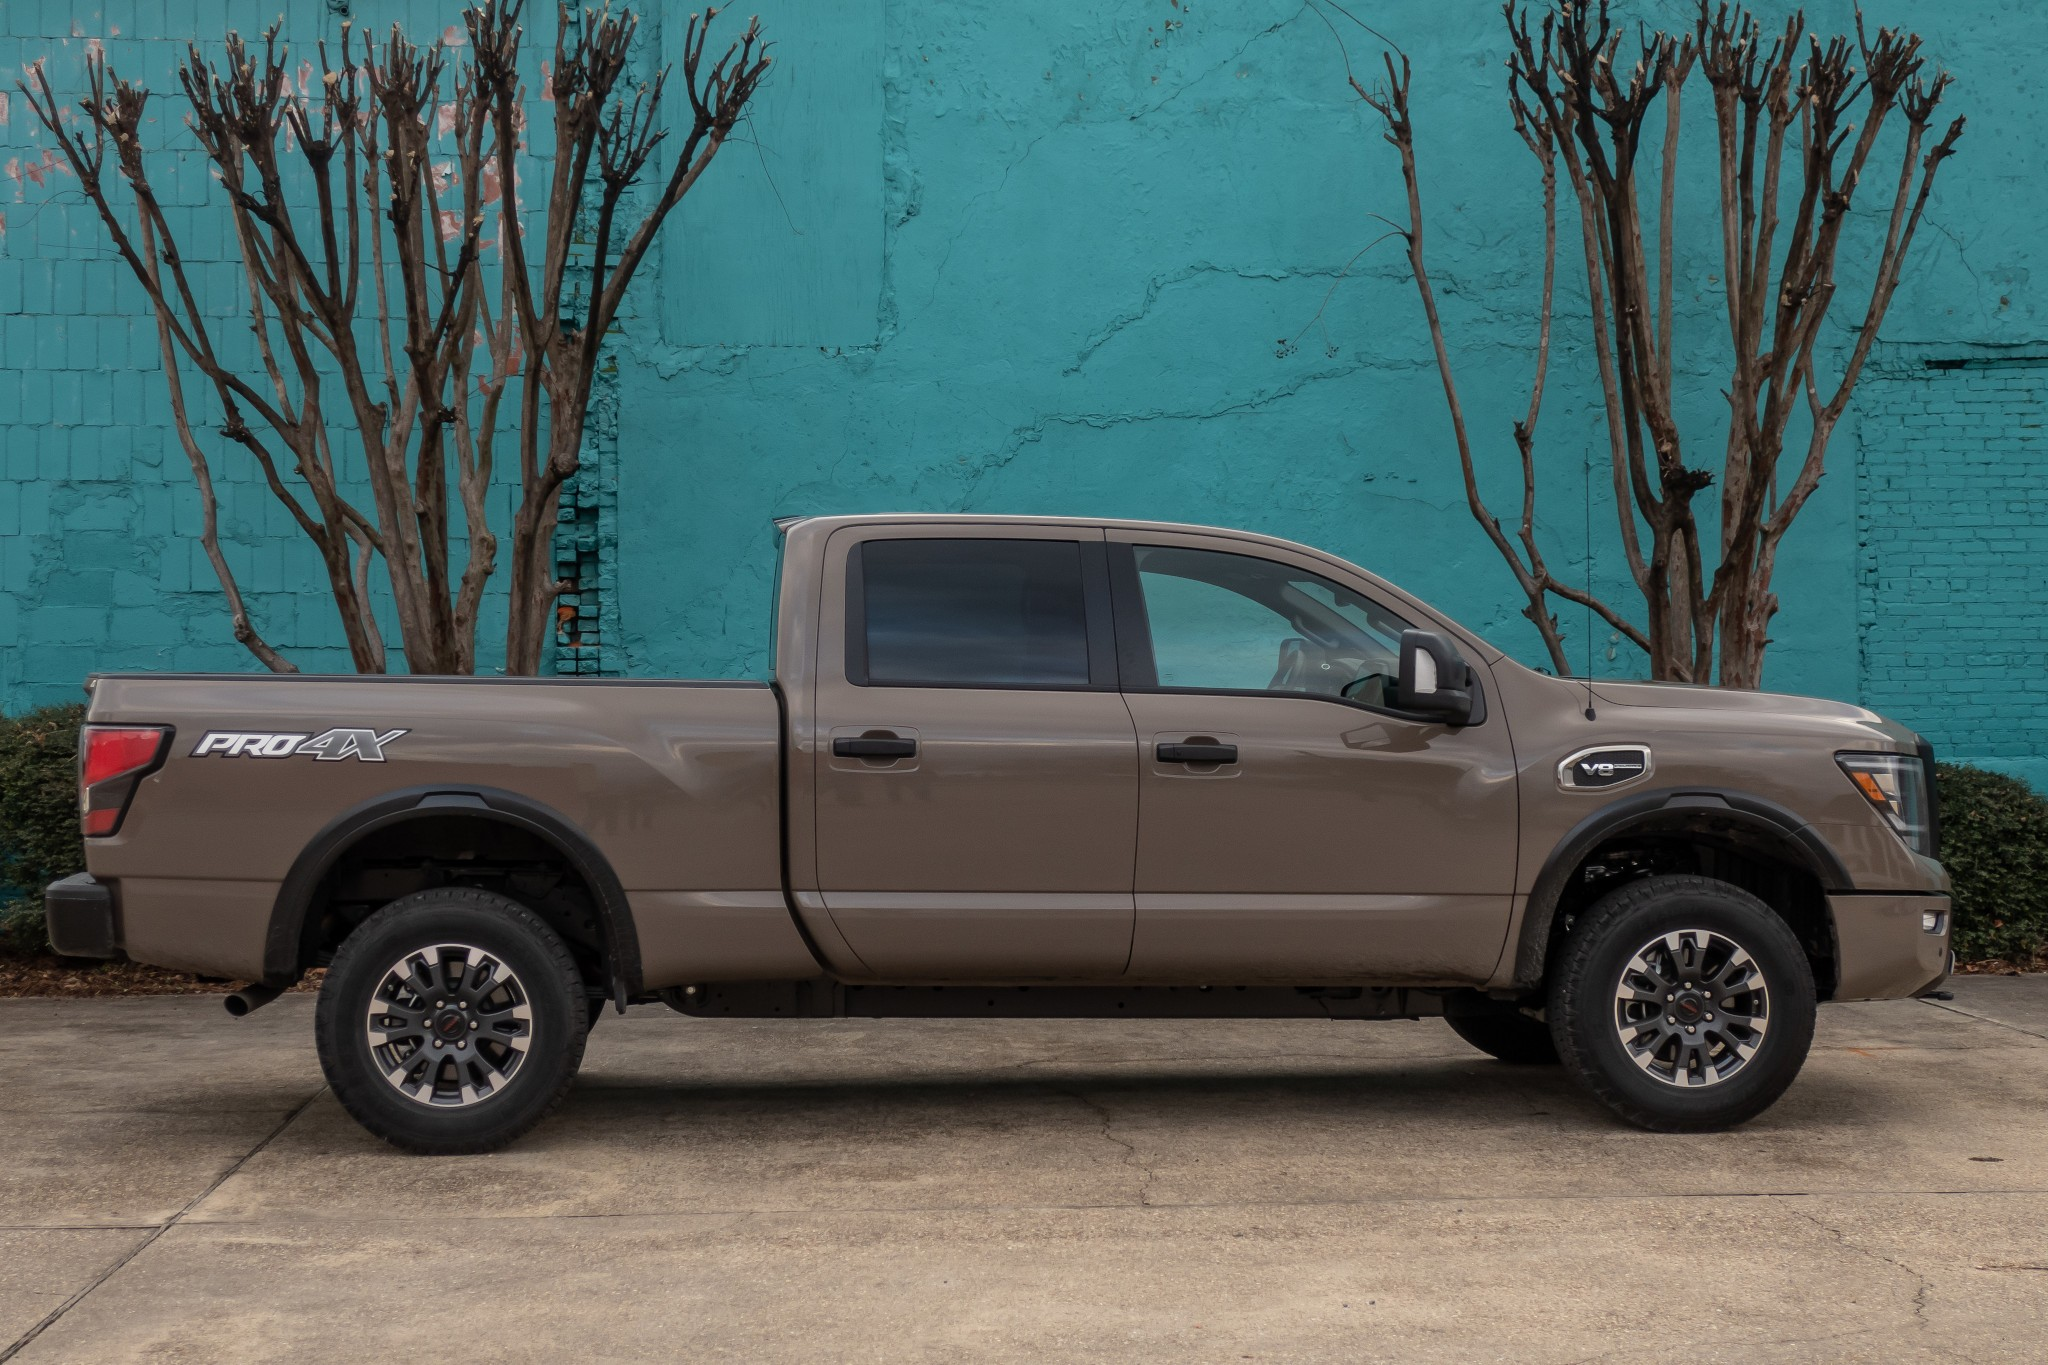 All the Pickup Truck News: 2020 Nissan Titan XD's Got Pull, 2020 Chicago Auto Show's Got Trucks and More